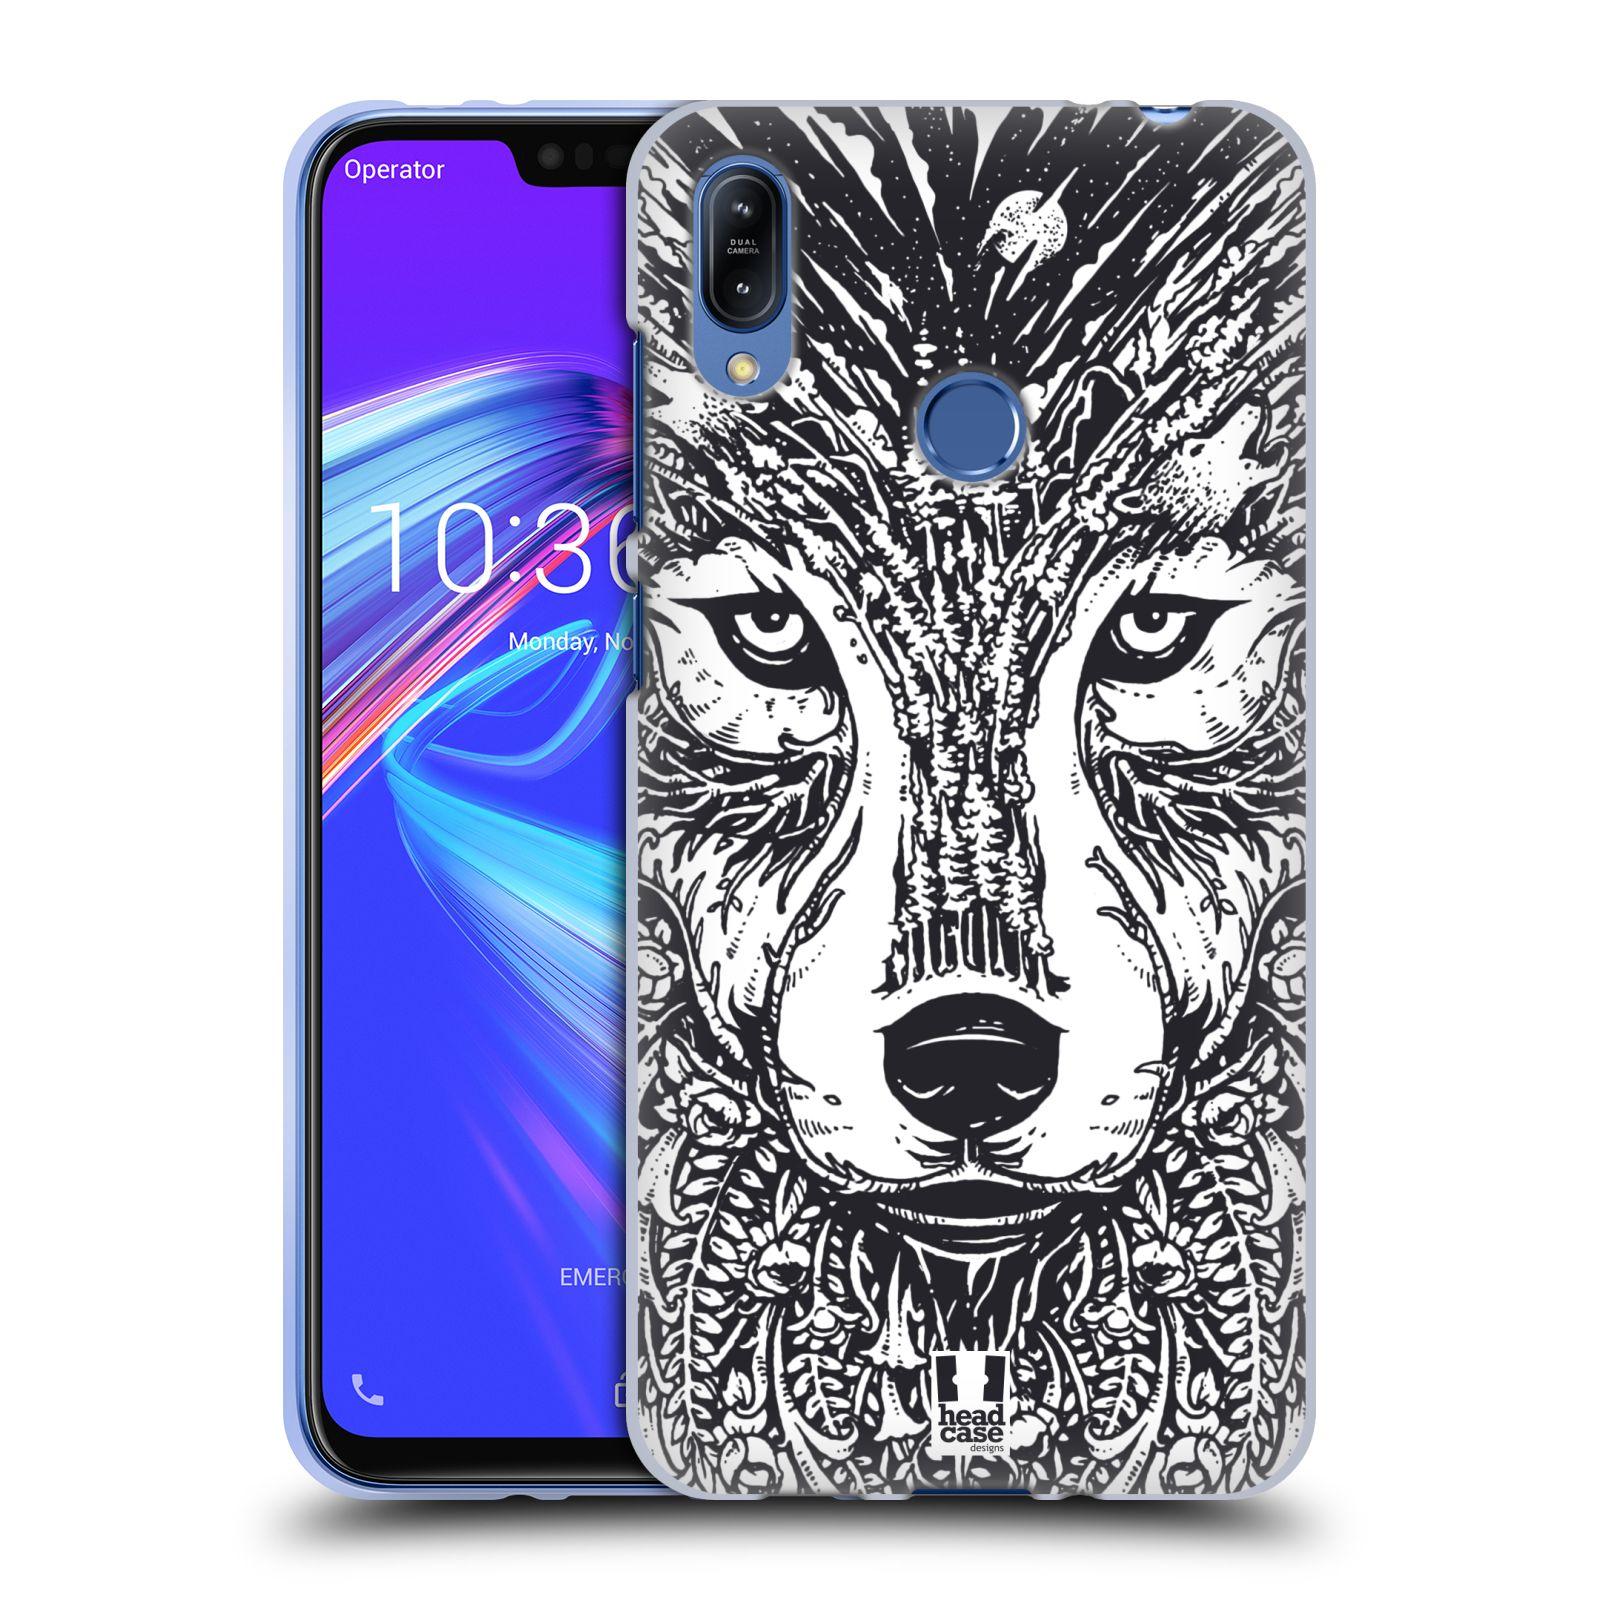 Silikonové pouzdro na mobil Asus Zenfone Max (M2) ZB633KL - Head Case - DOODLE TVÁŘ VLK